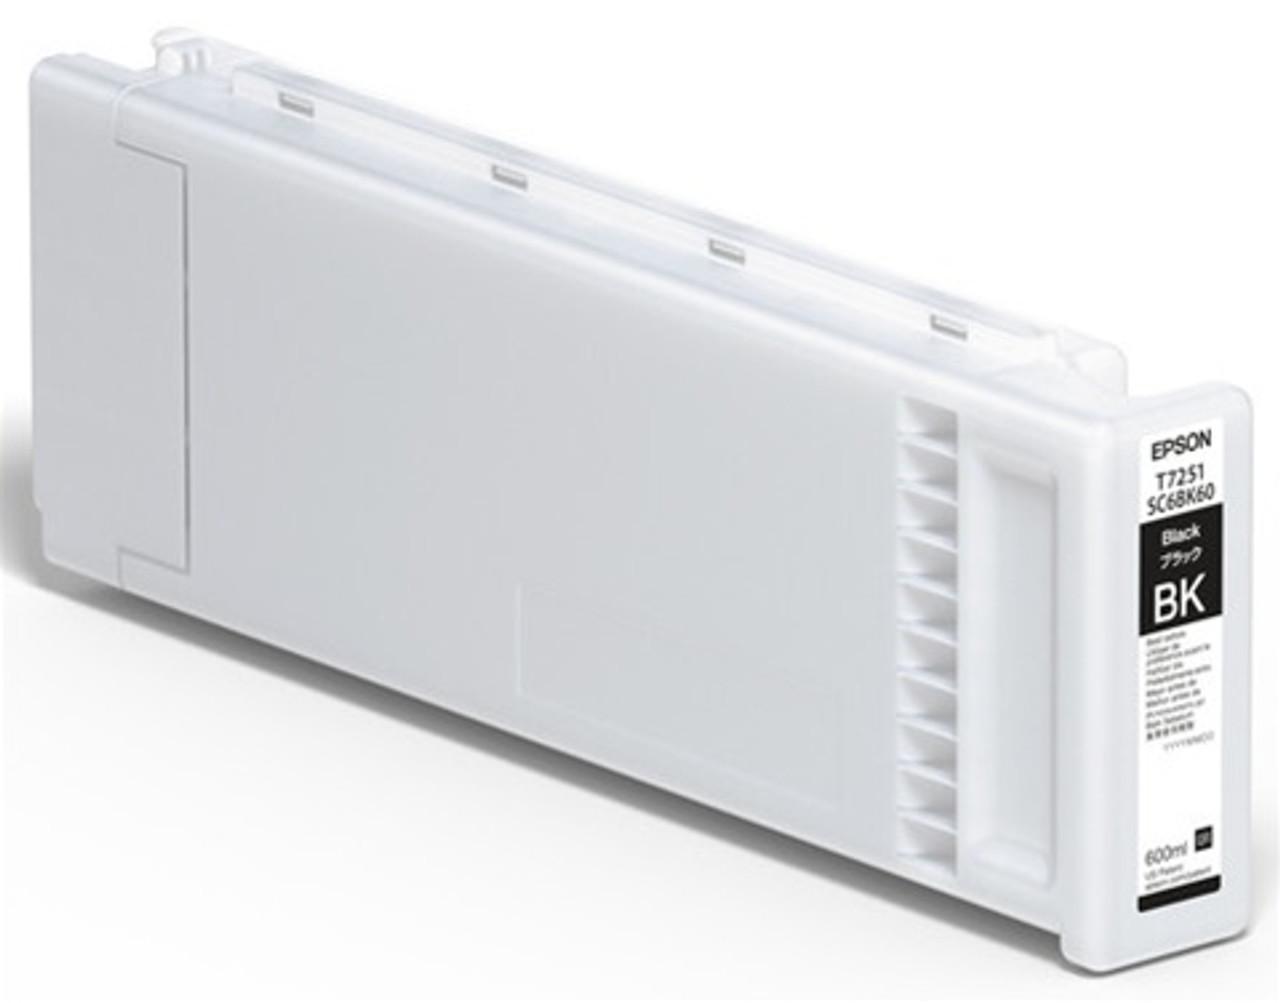 Epson F2100/F2000 Ink Cartridge, BLACK 600ML